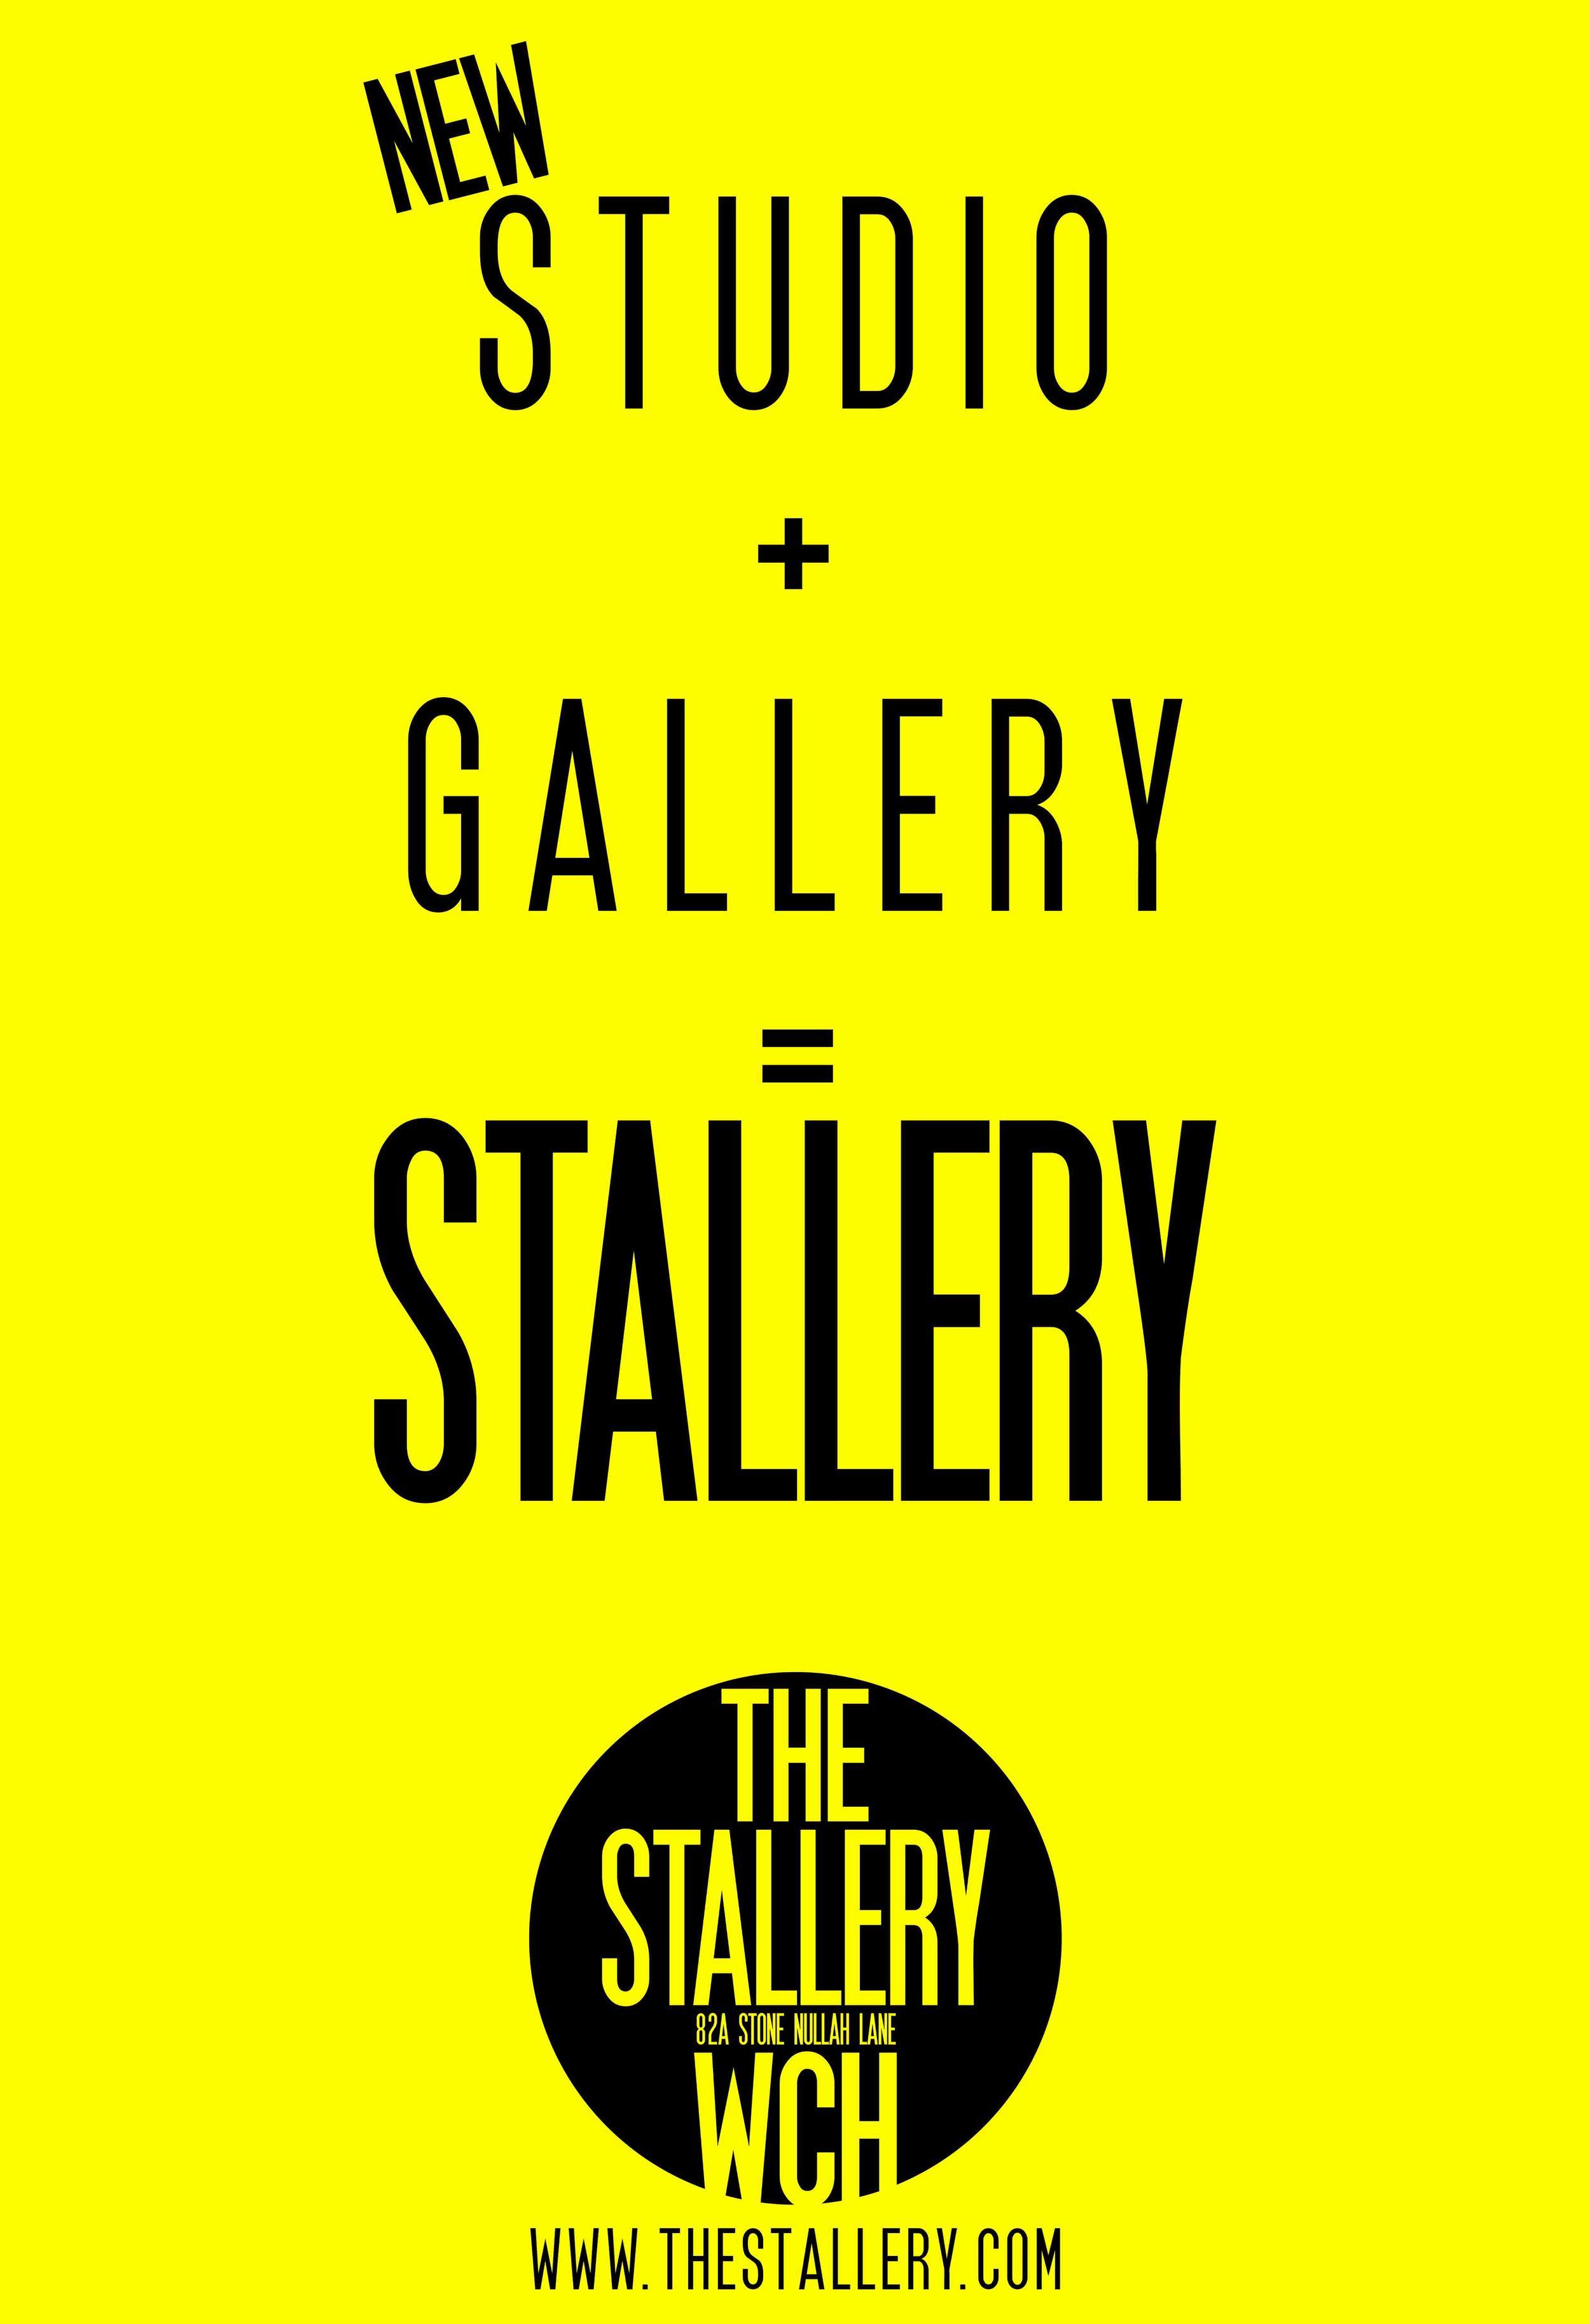 New Gallery Yellow Poster.jpg